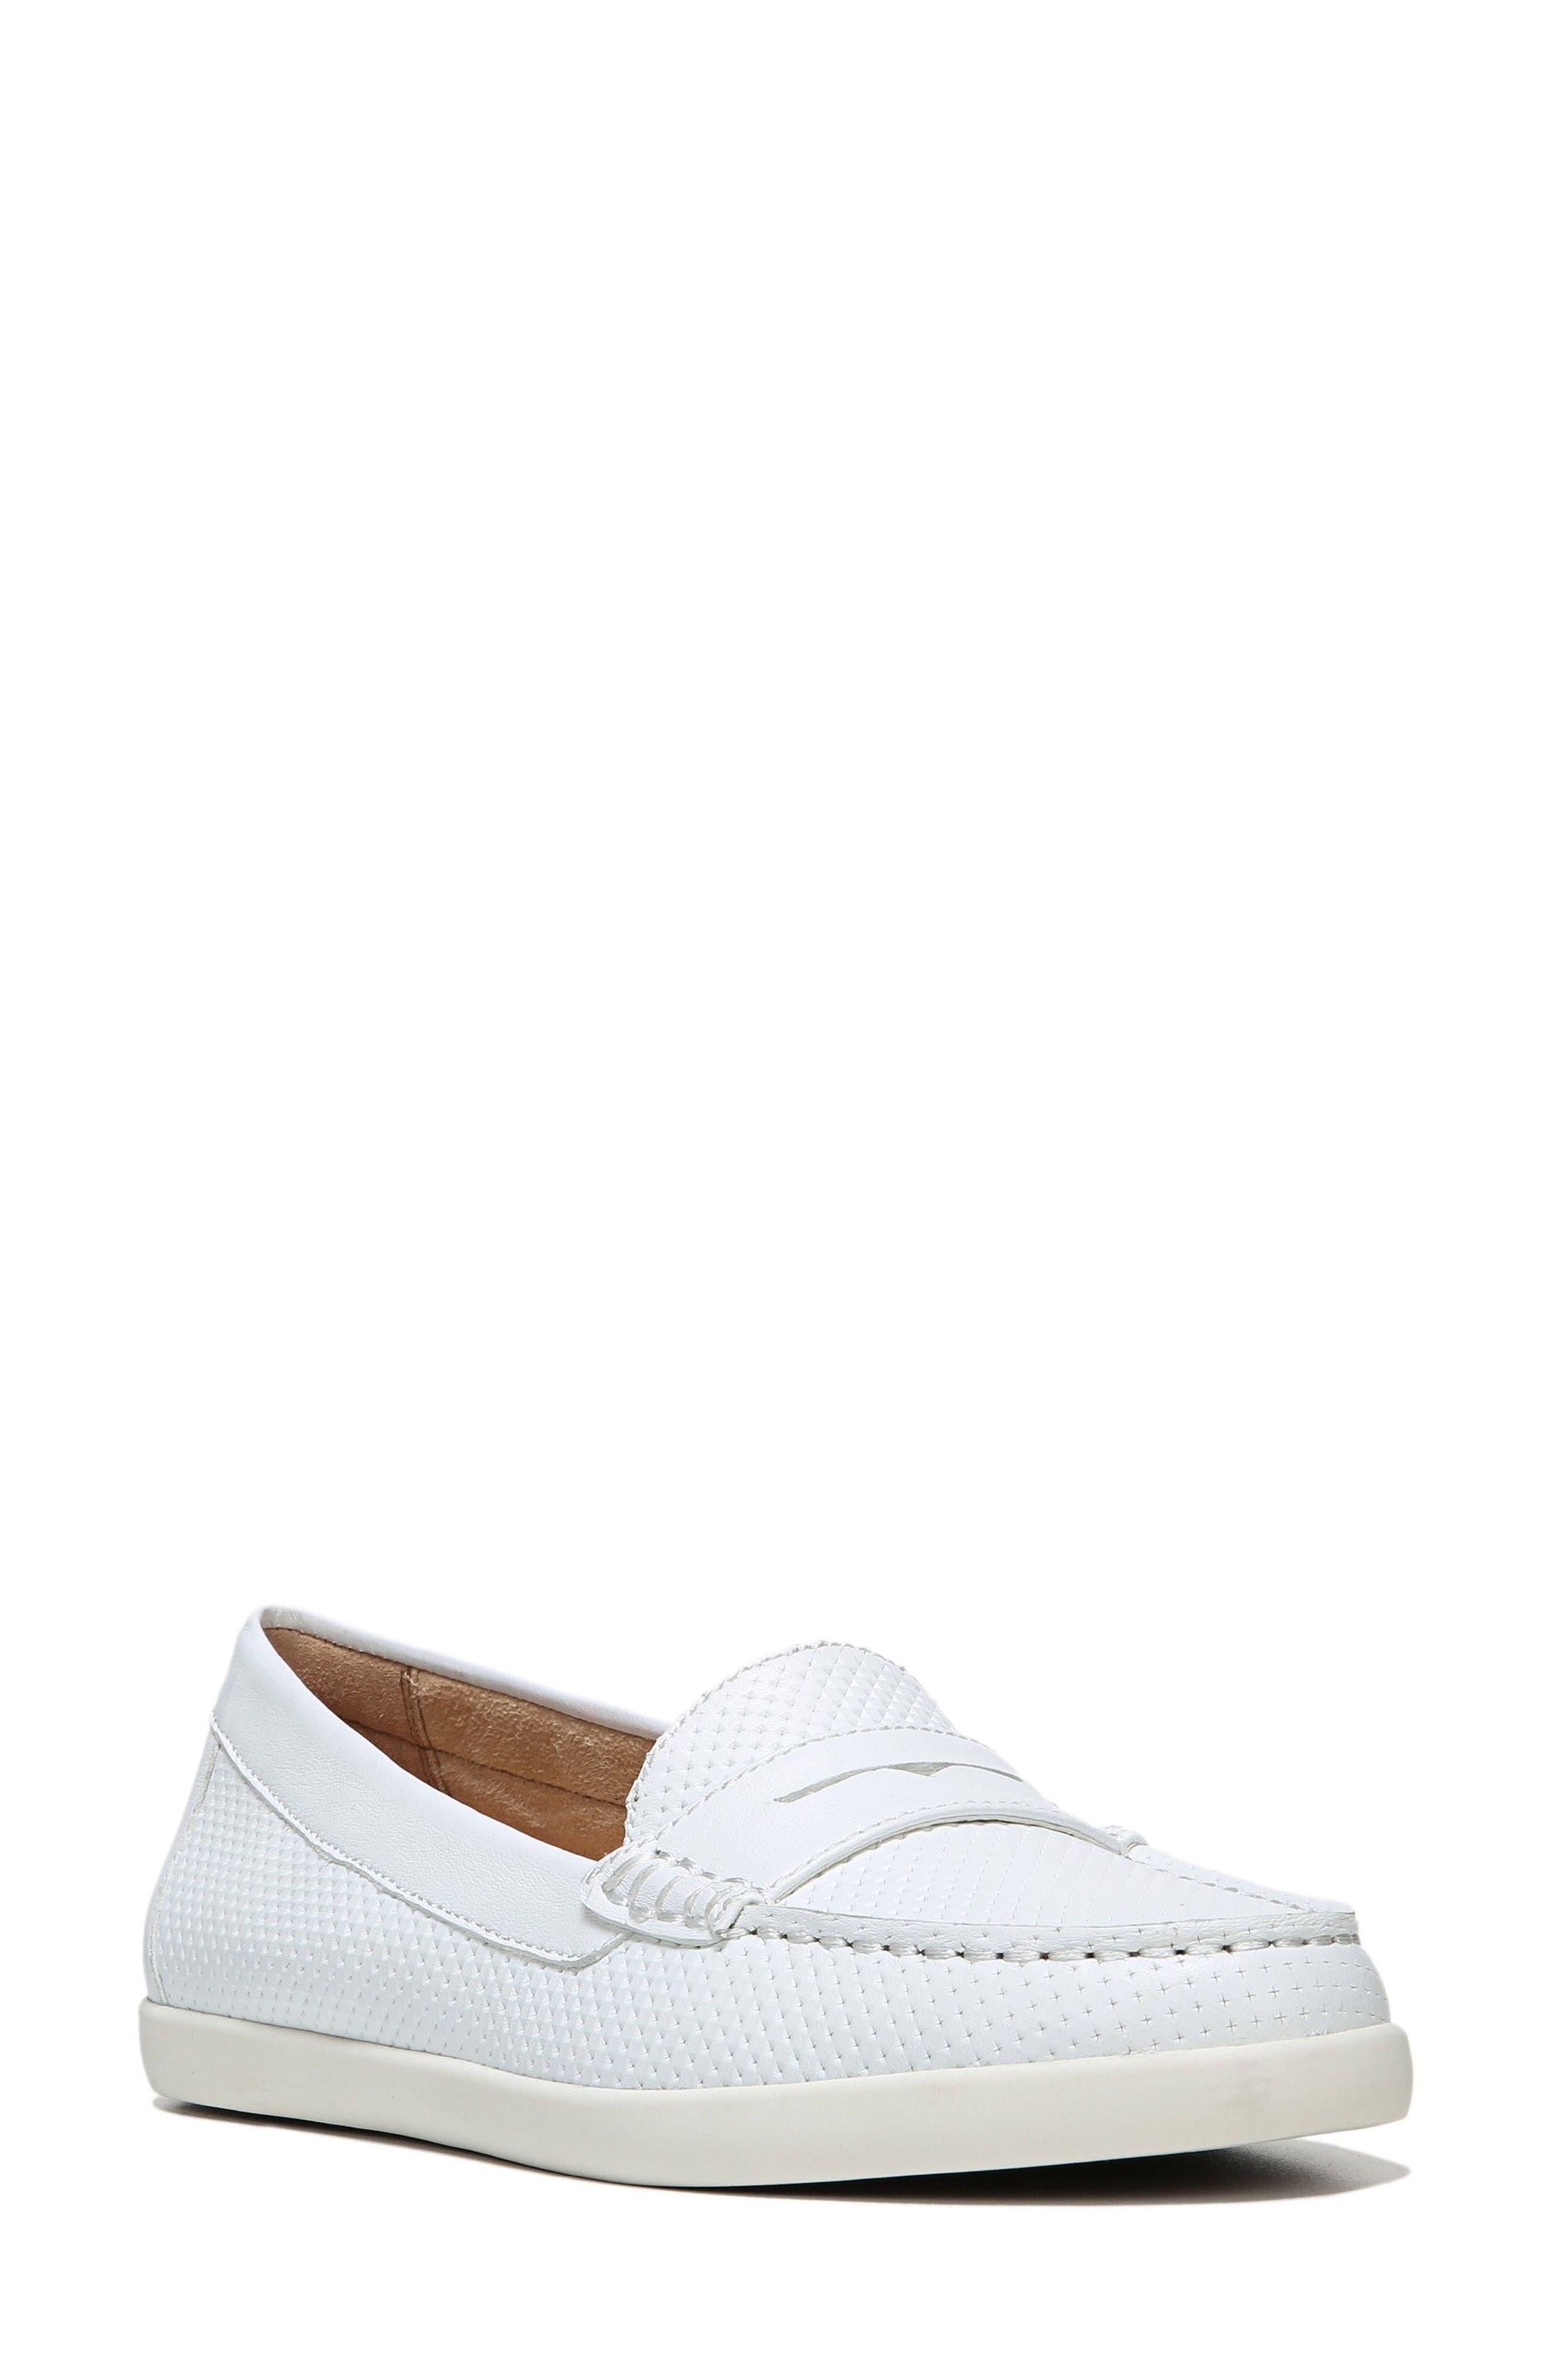 Gwen Slip-On Sneaker,                             Main thumbnail 1, color,                             WHITE LEATHER